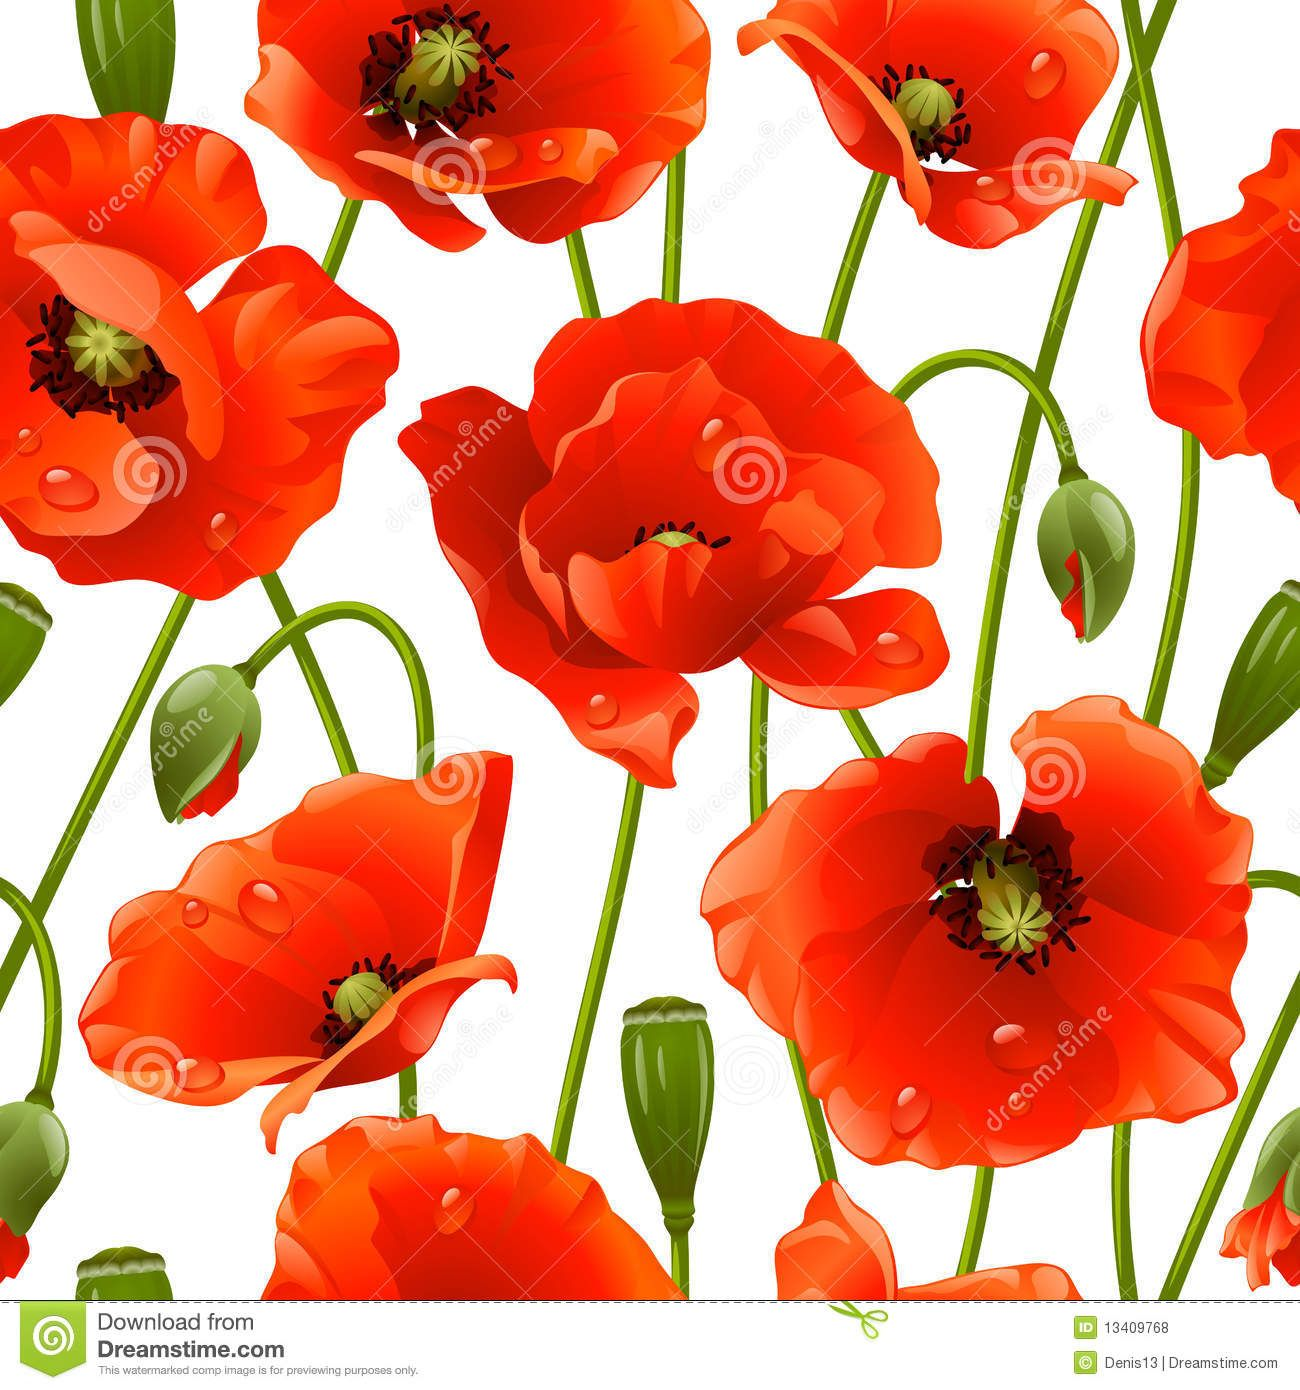 Seamless background poppy stock vector. Illustration of